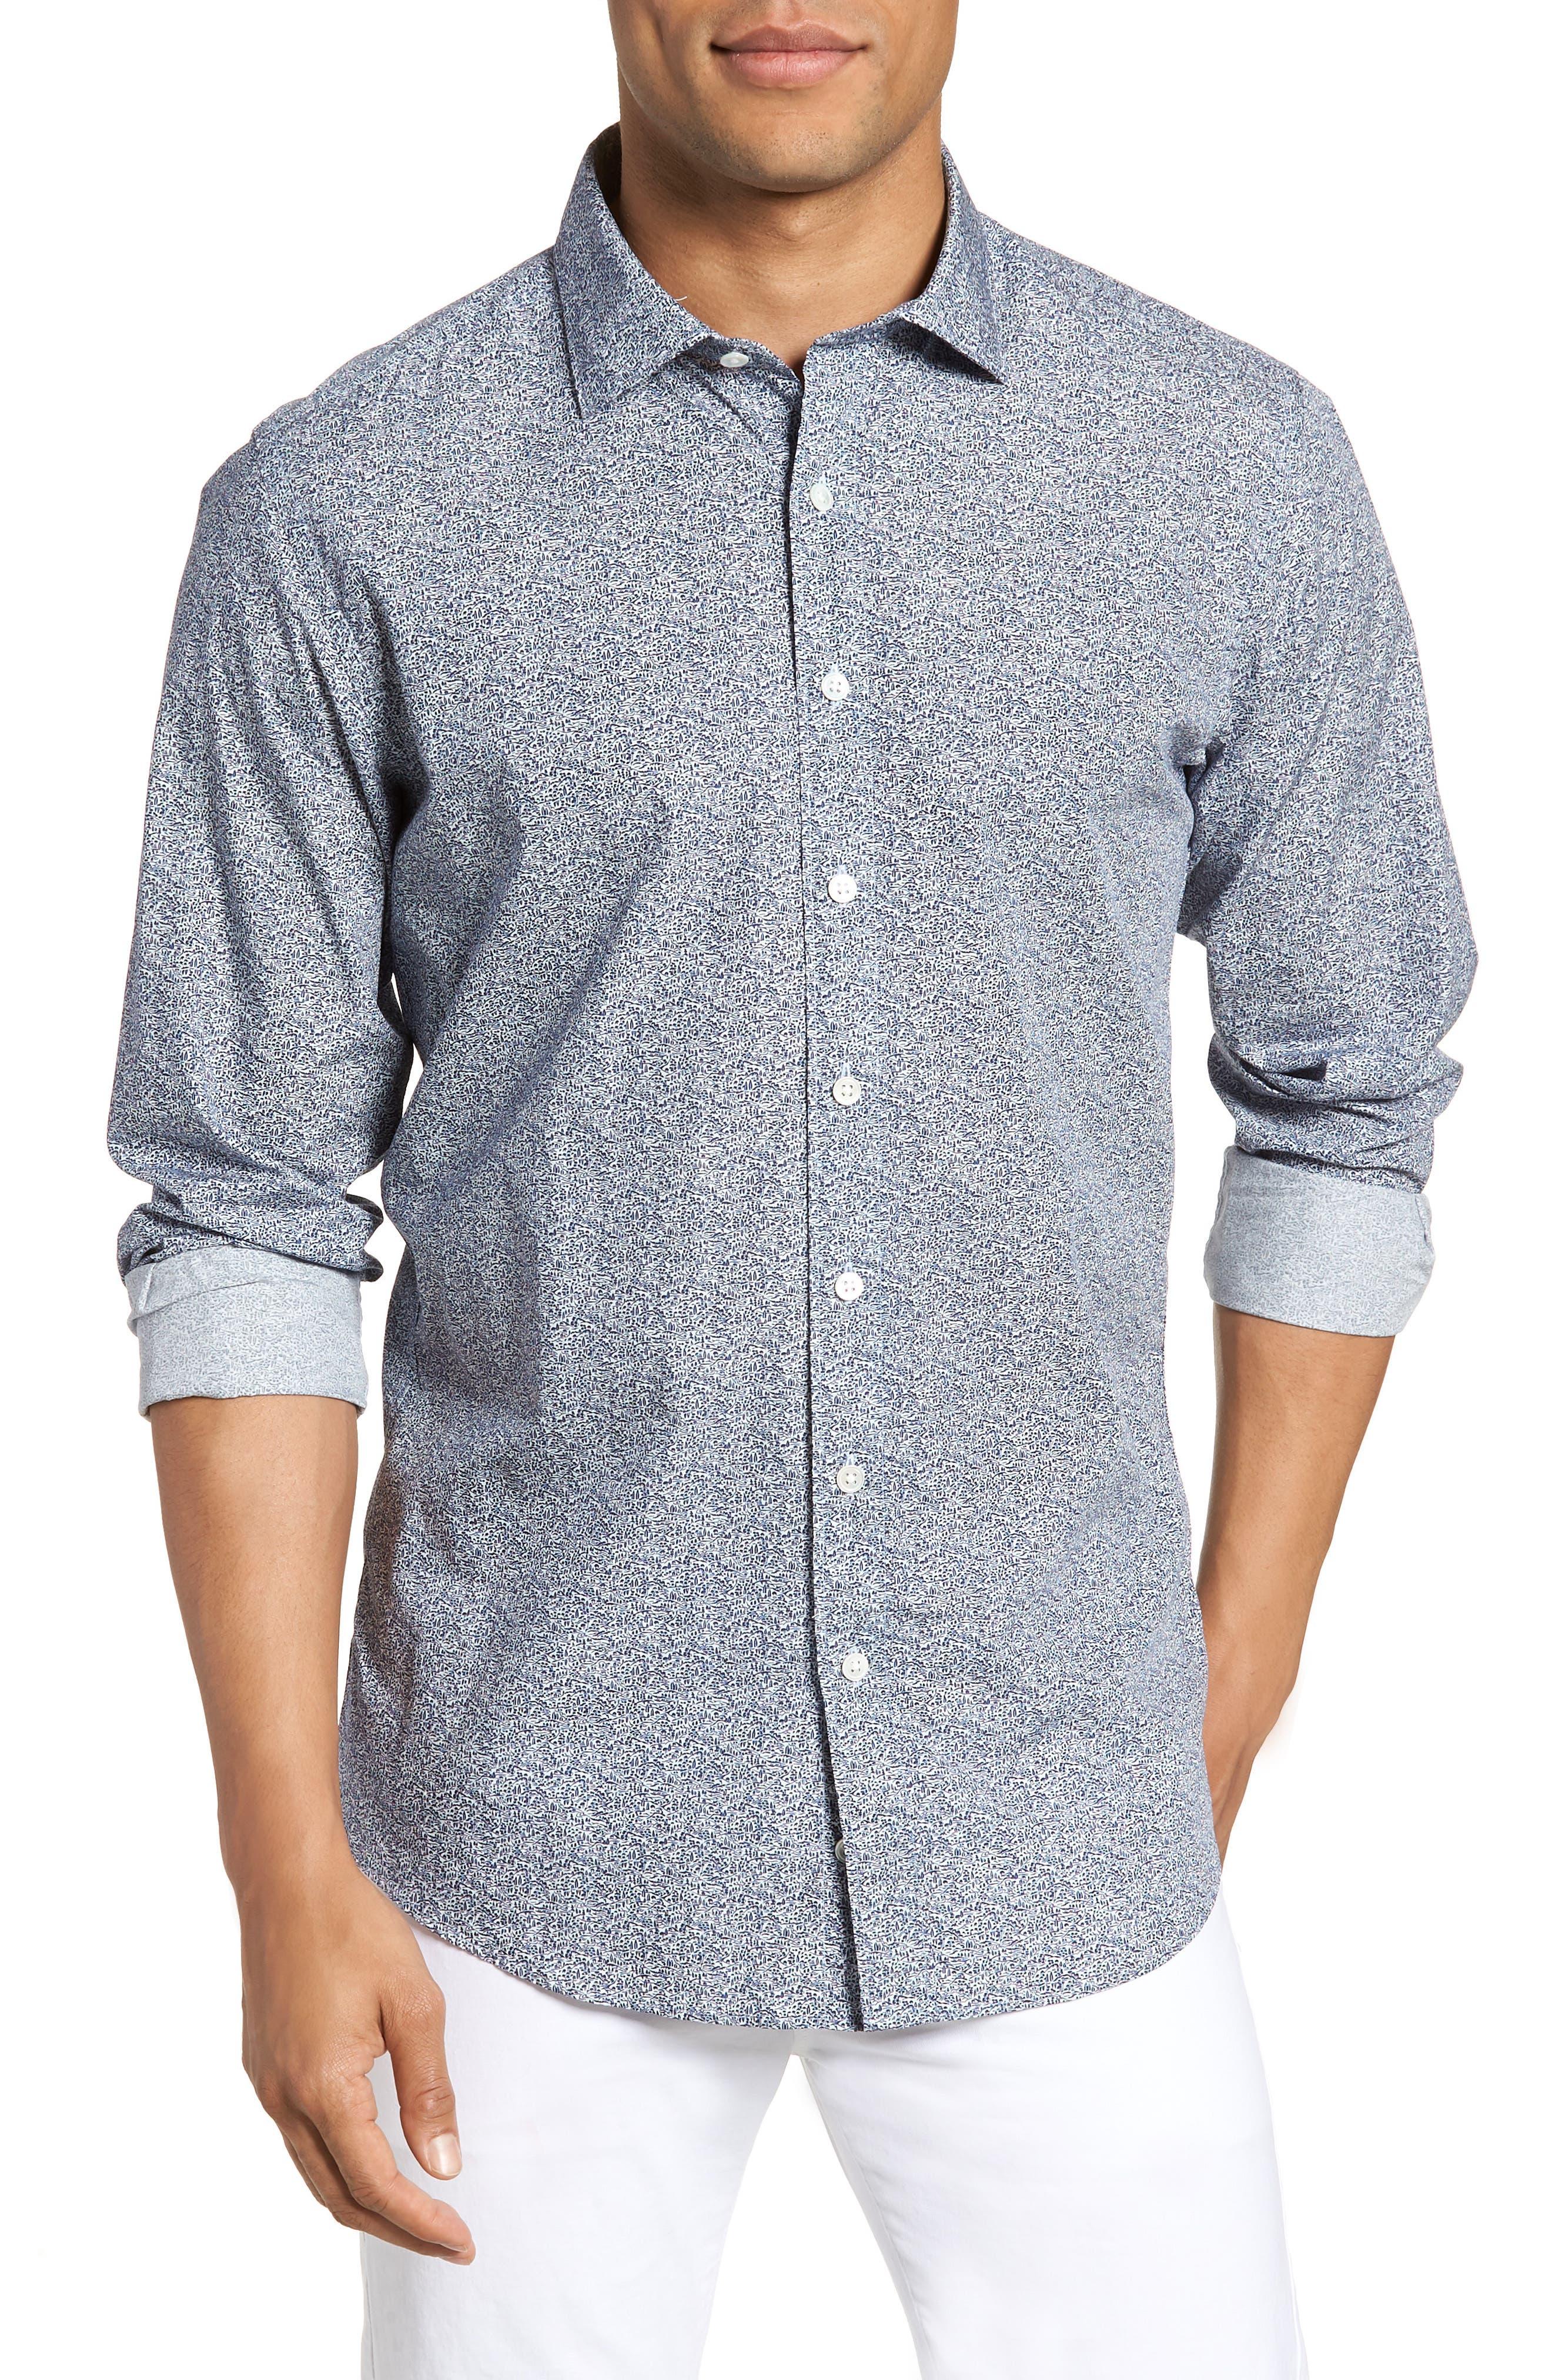 Massey West Slim Fit Sport Shirt,                             Main thumbnail 1, color,                             Ink